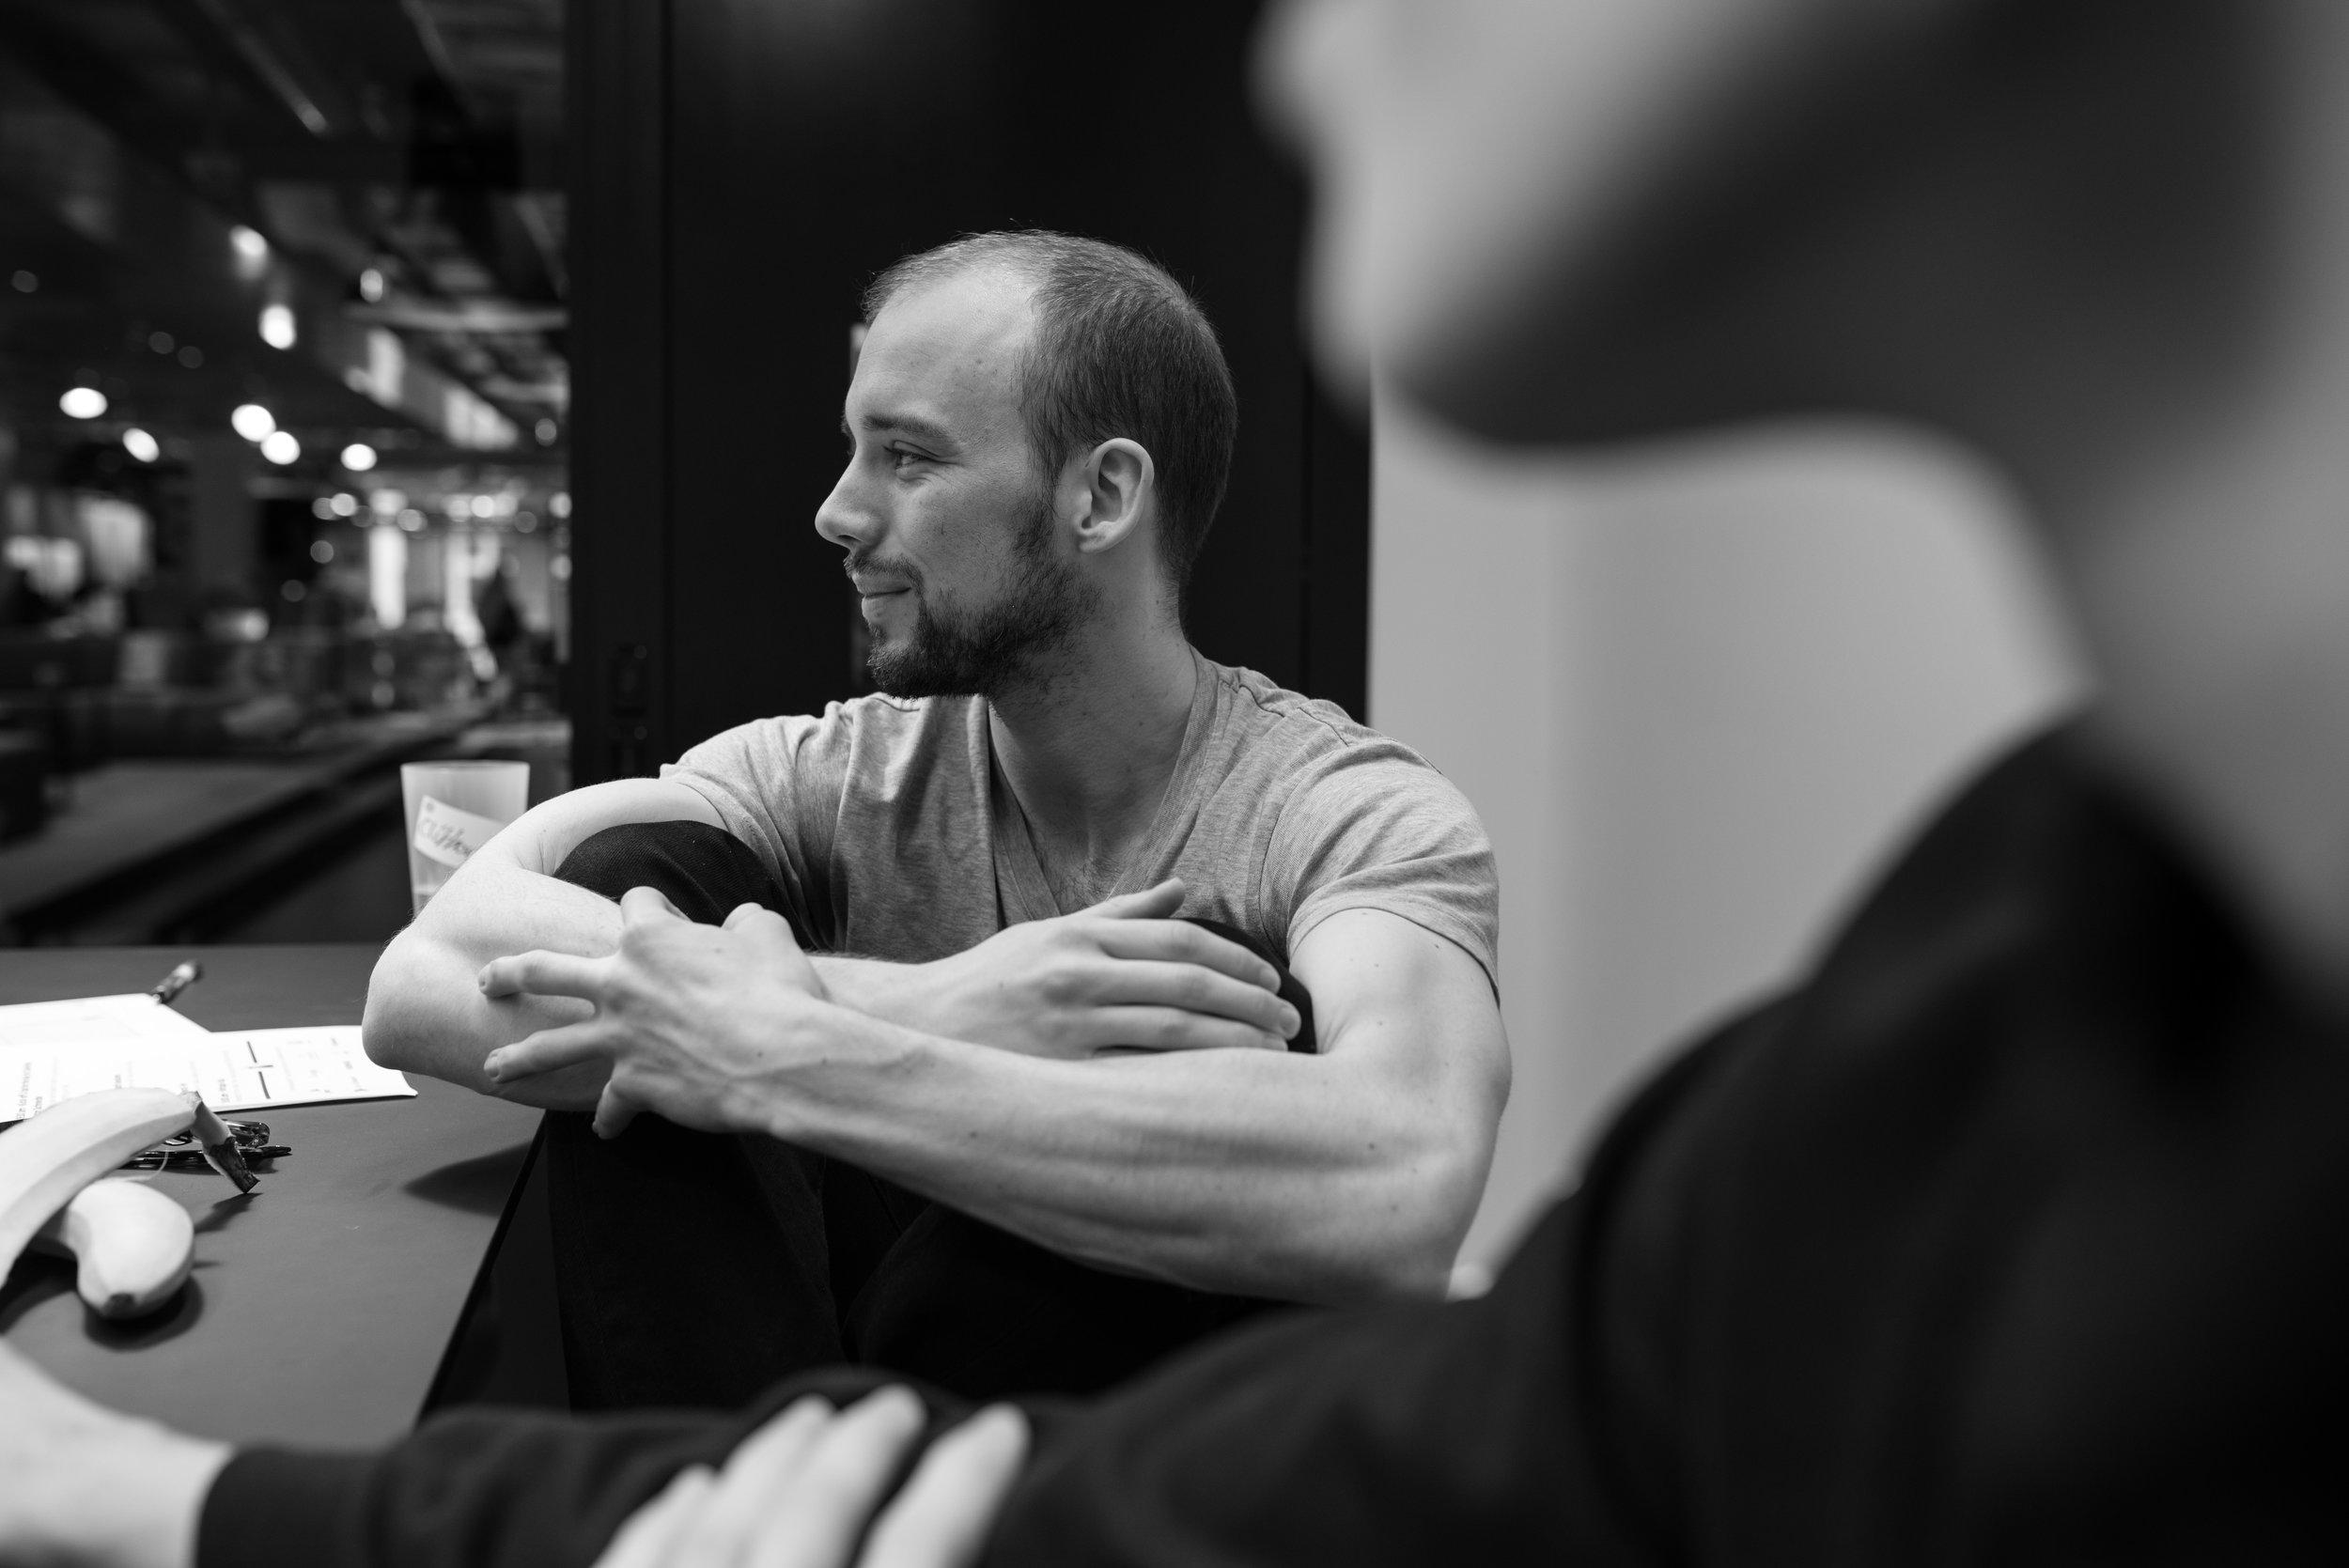 Photo of a team member taken during Startup Weekend in Prague by Tatiana Shalunova.jpg